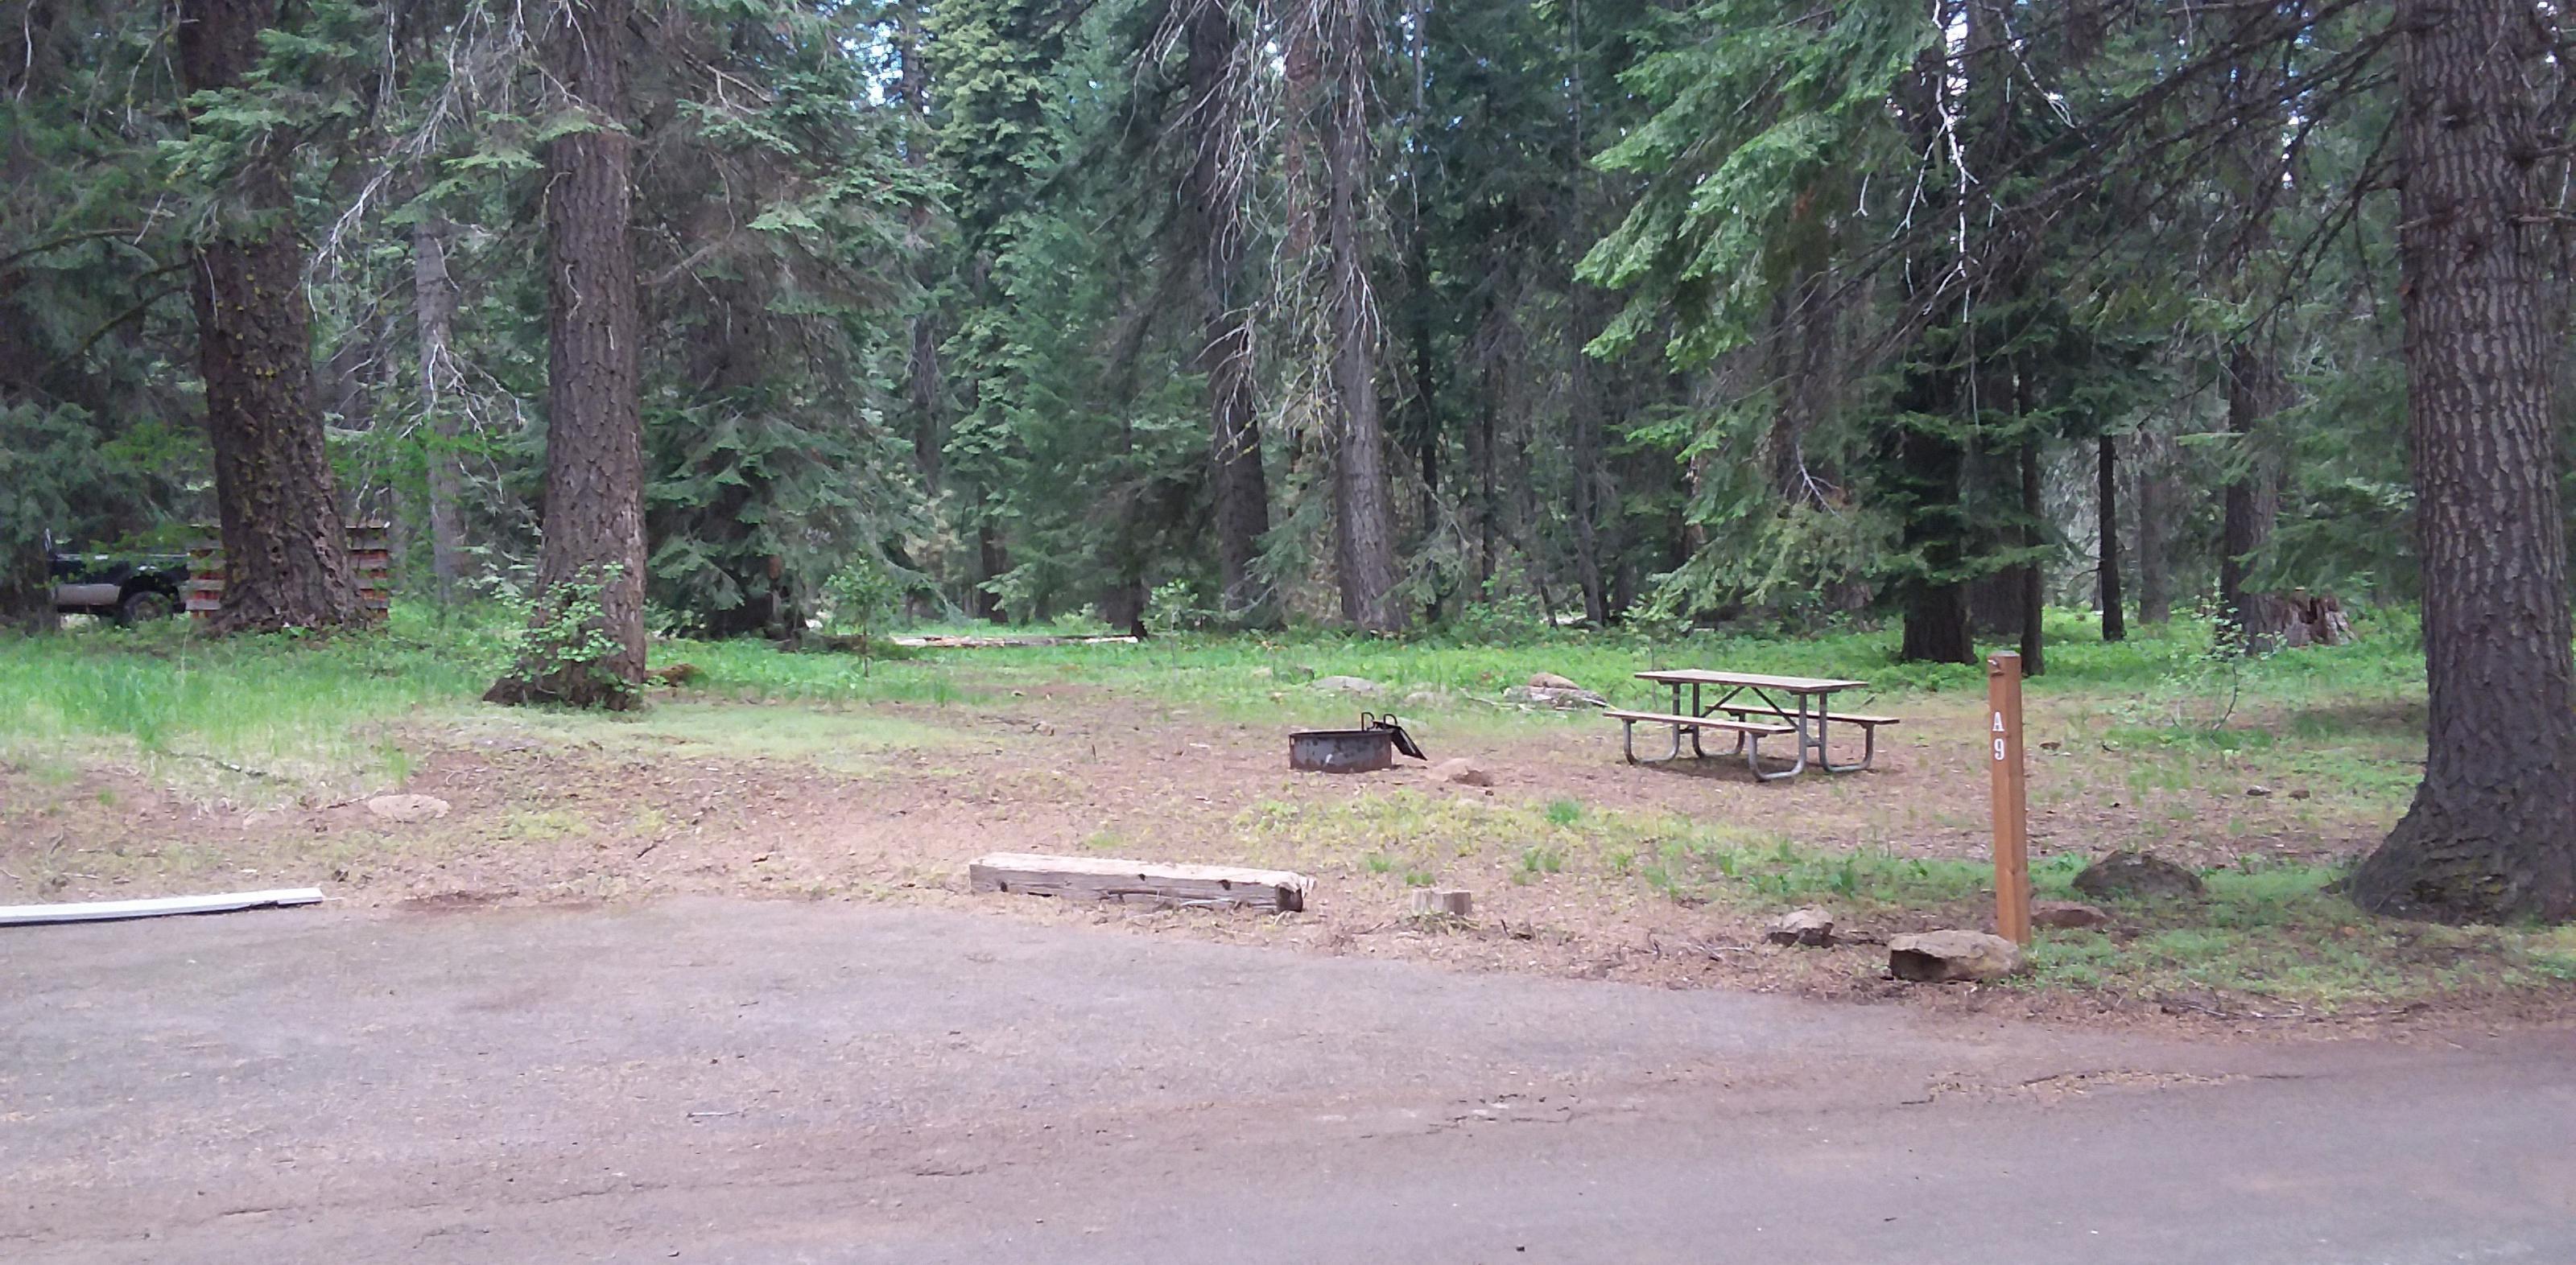 Campsite A9- Hyatt LakeCampsite 9, Loop A Hyatt Lake